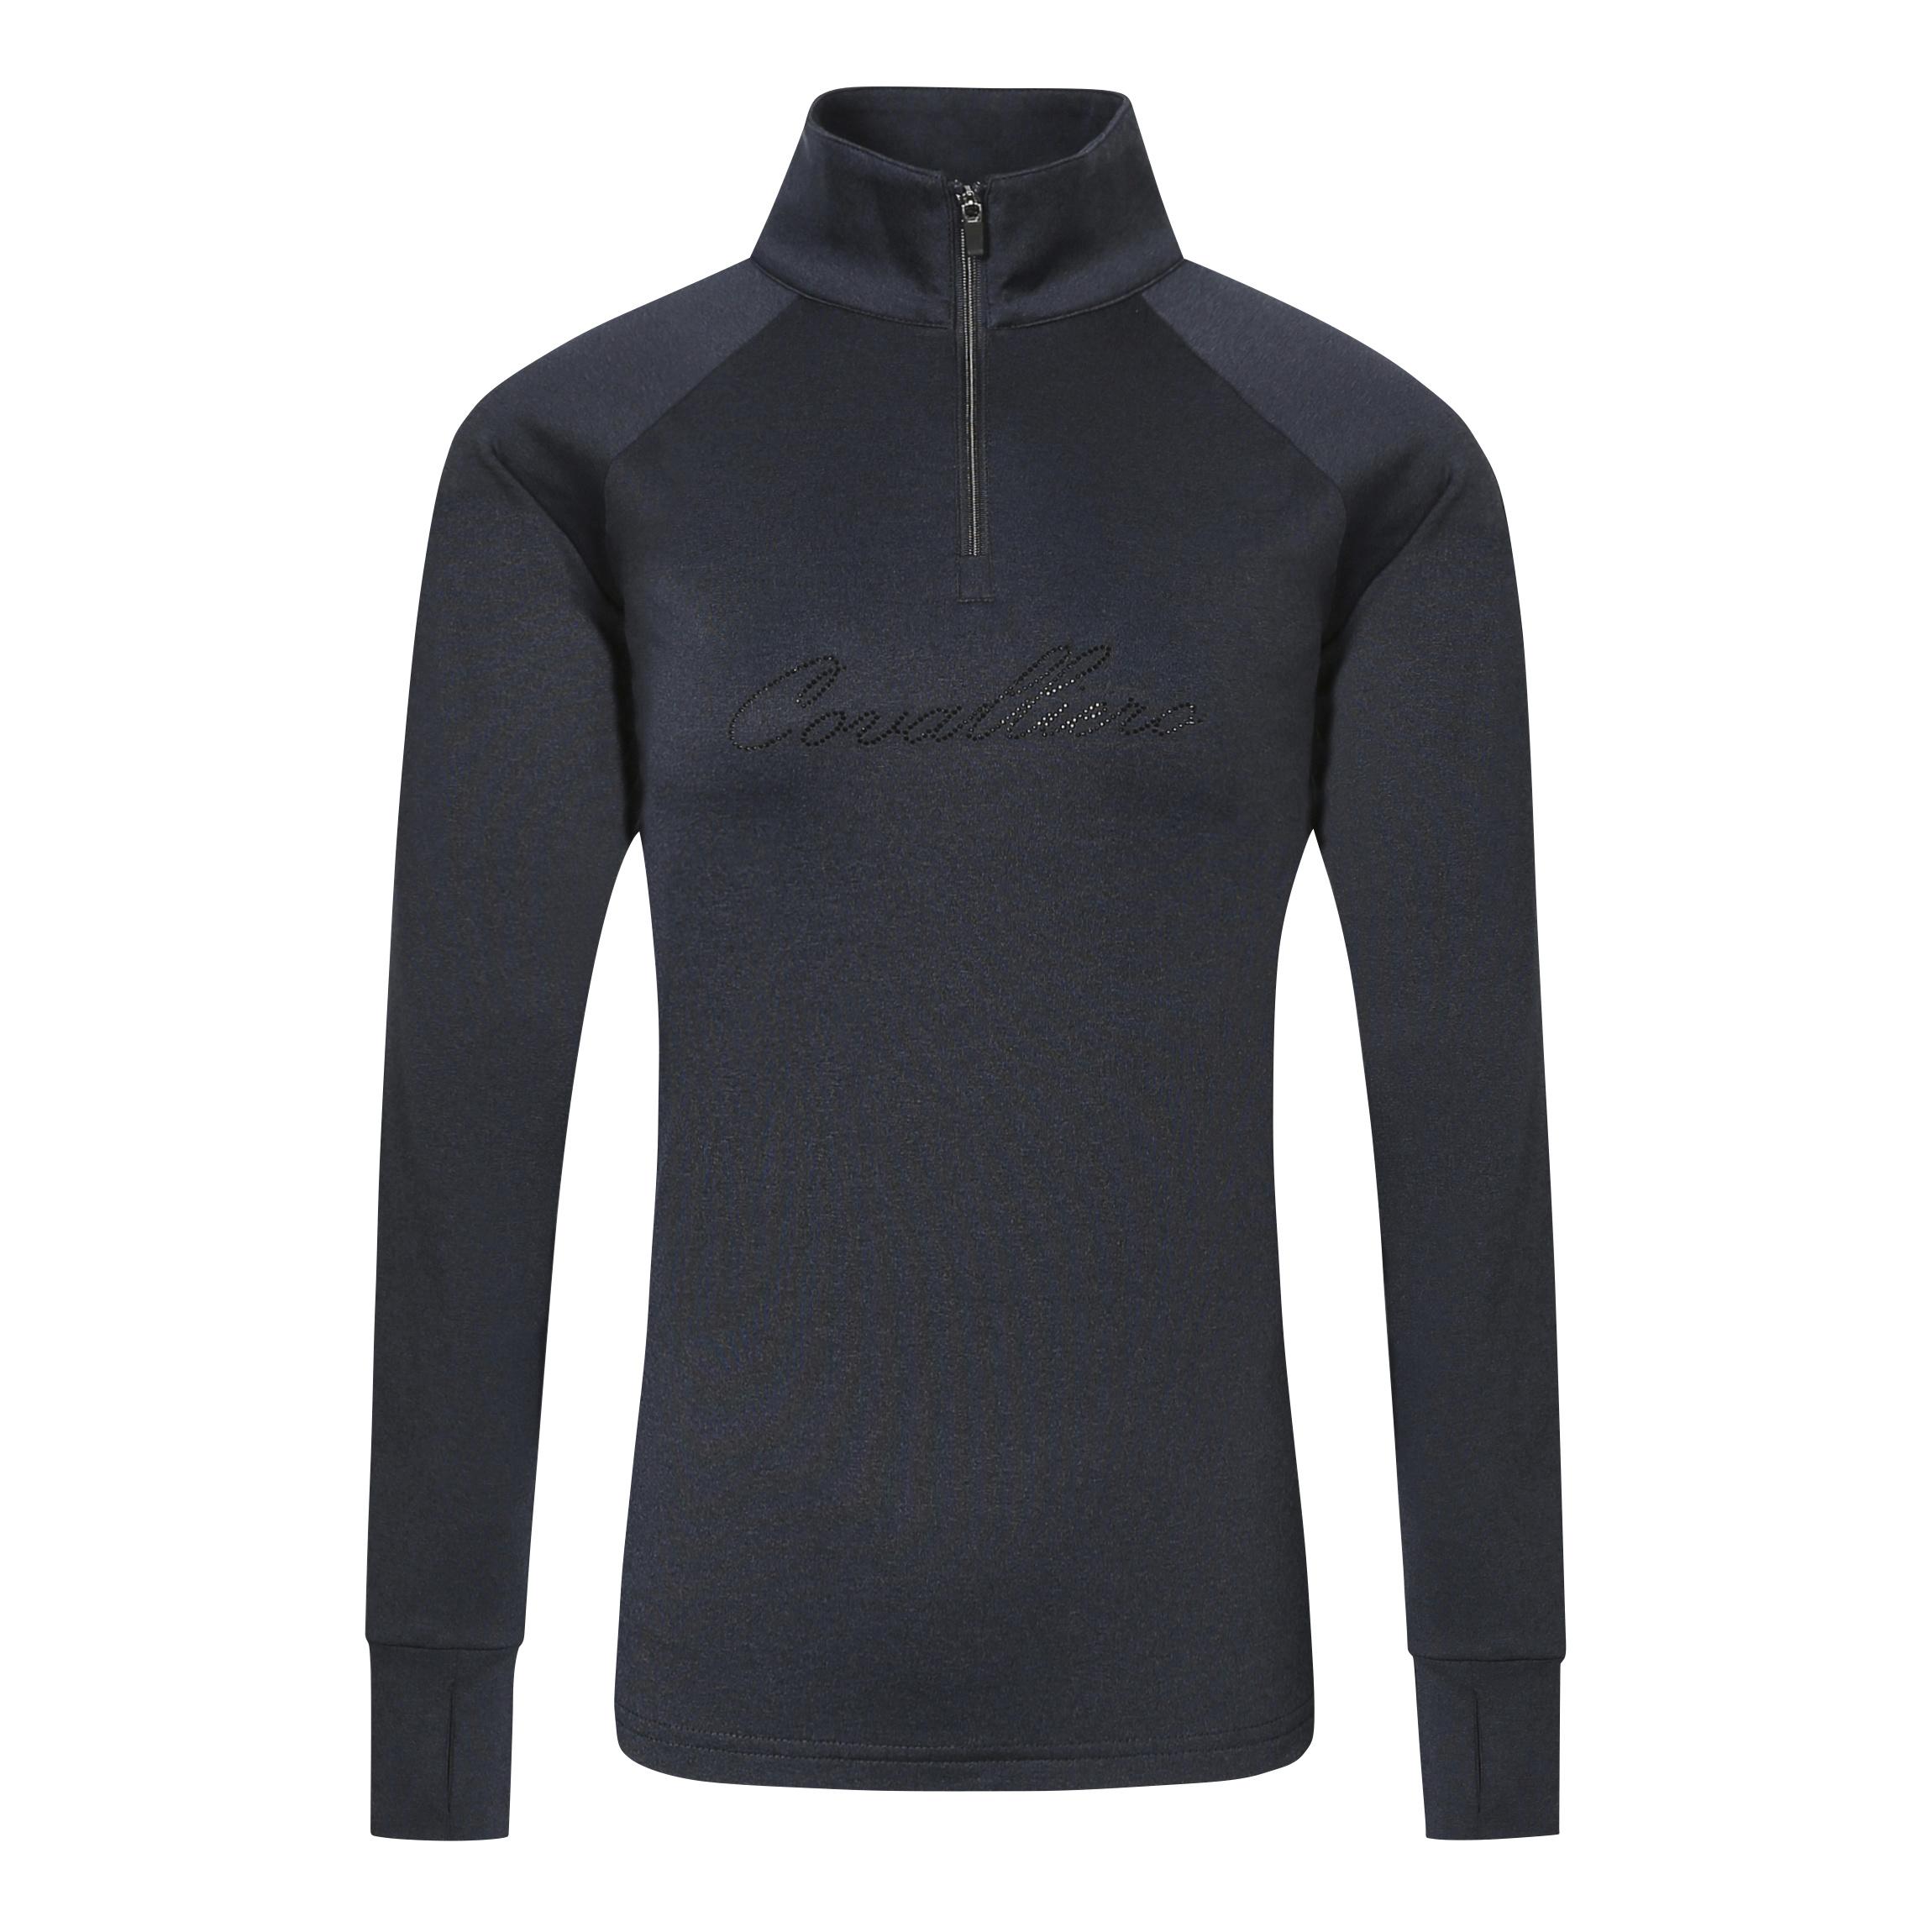 Covalliero Active wärmendes Langarm-Shirt